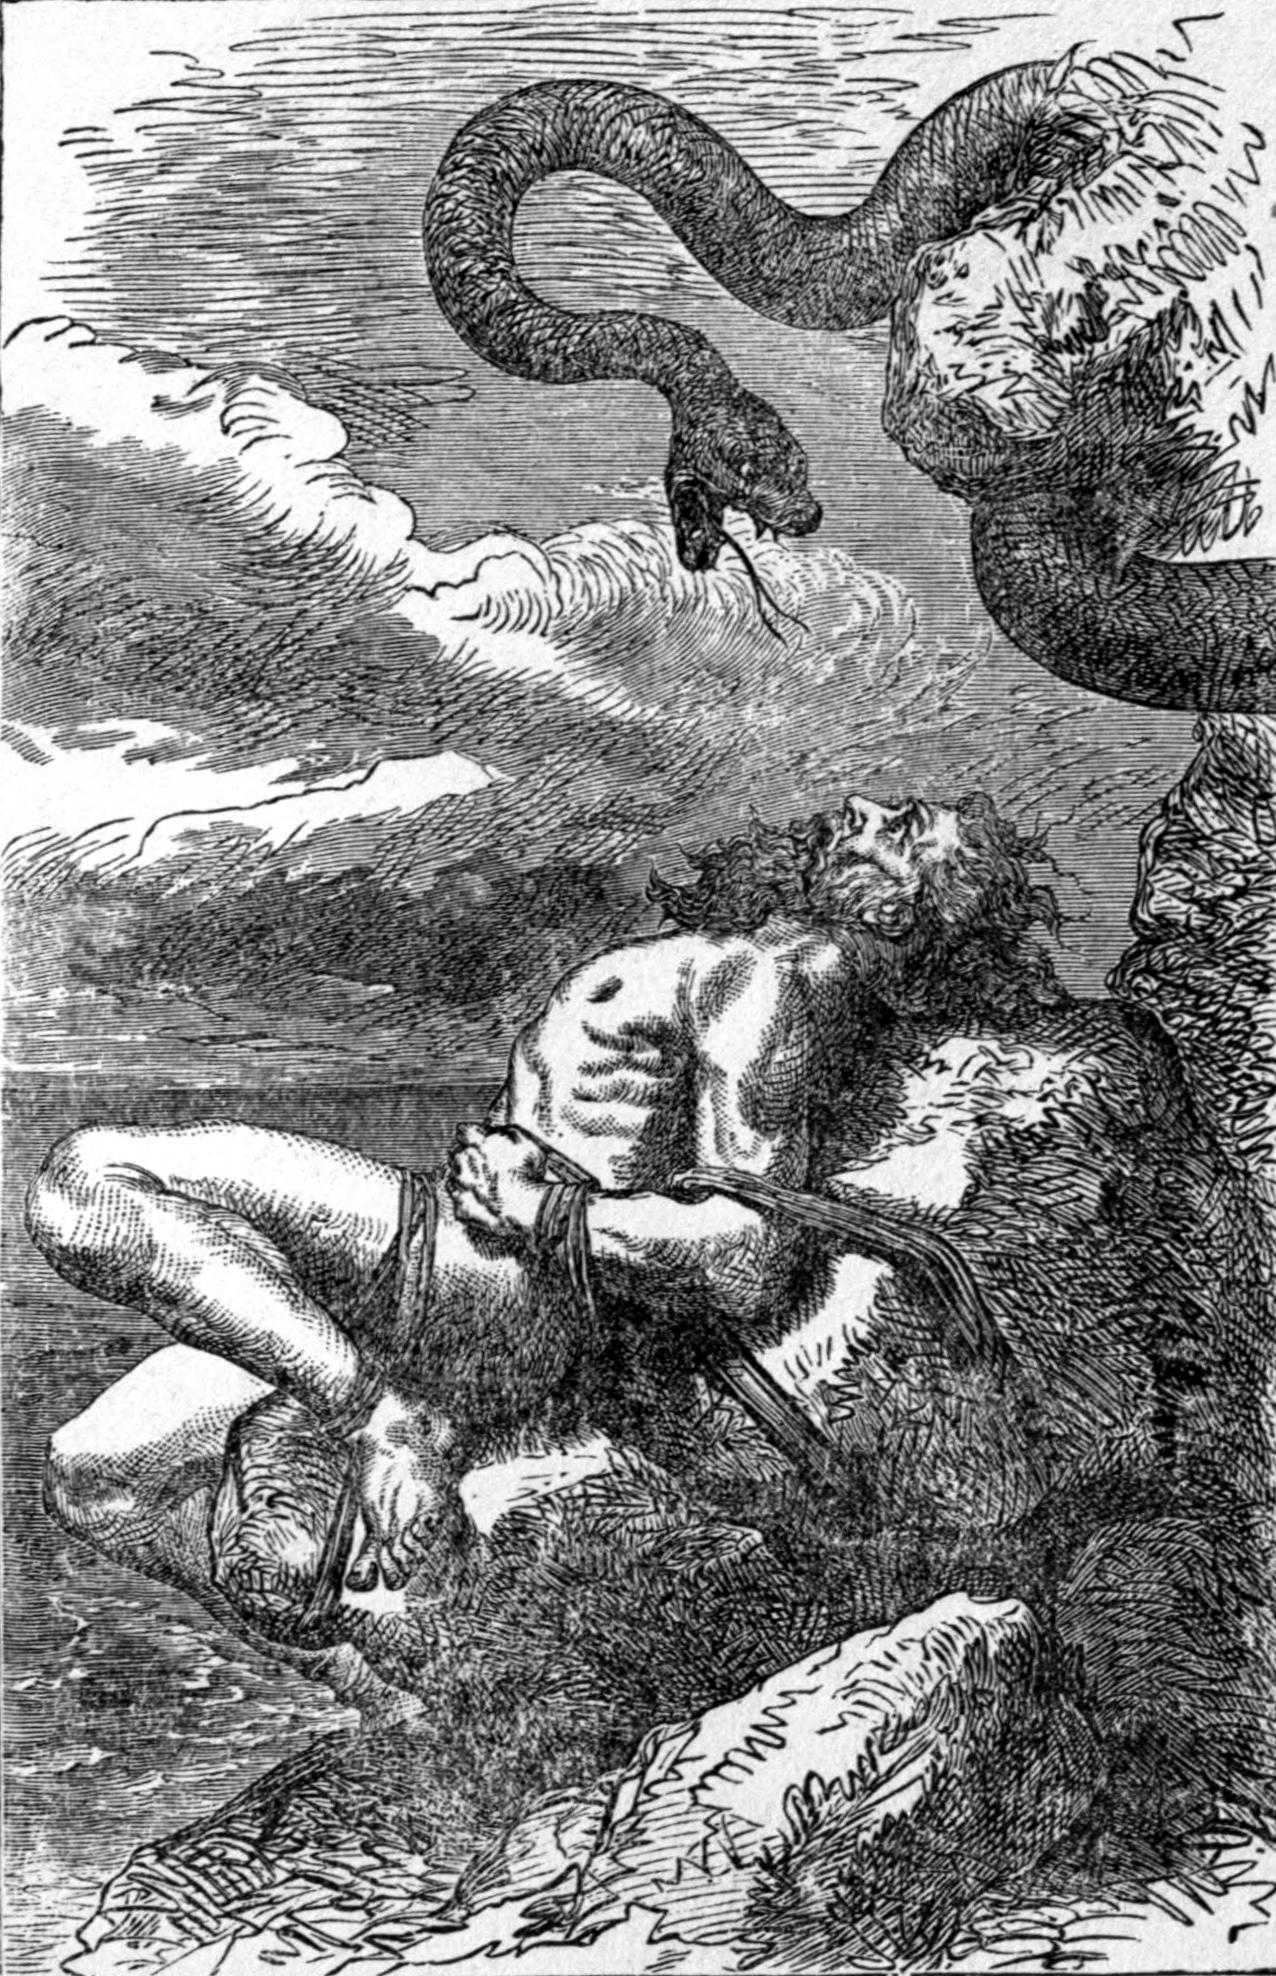 The punishment of Loki (Image: Louis Huard / Wikimedia Commons)